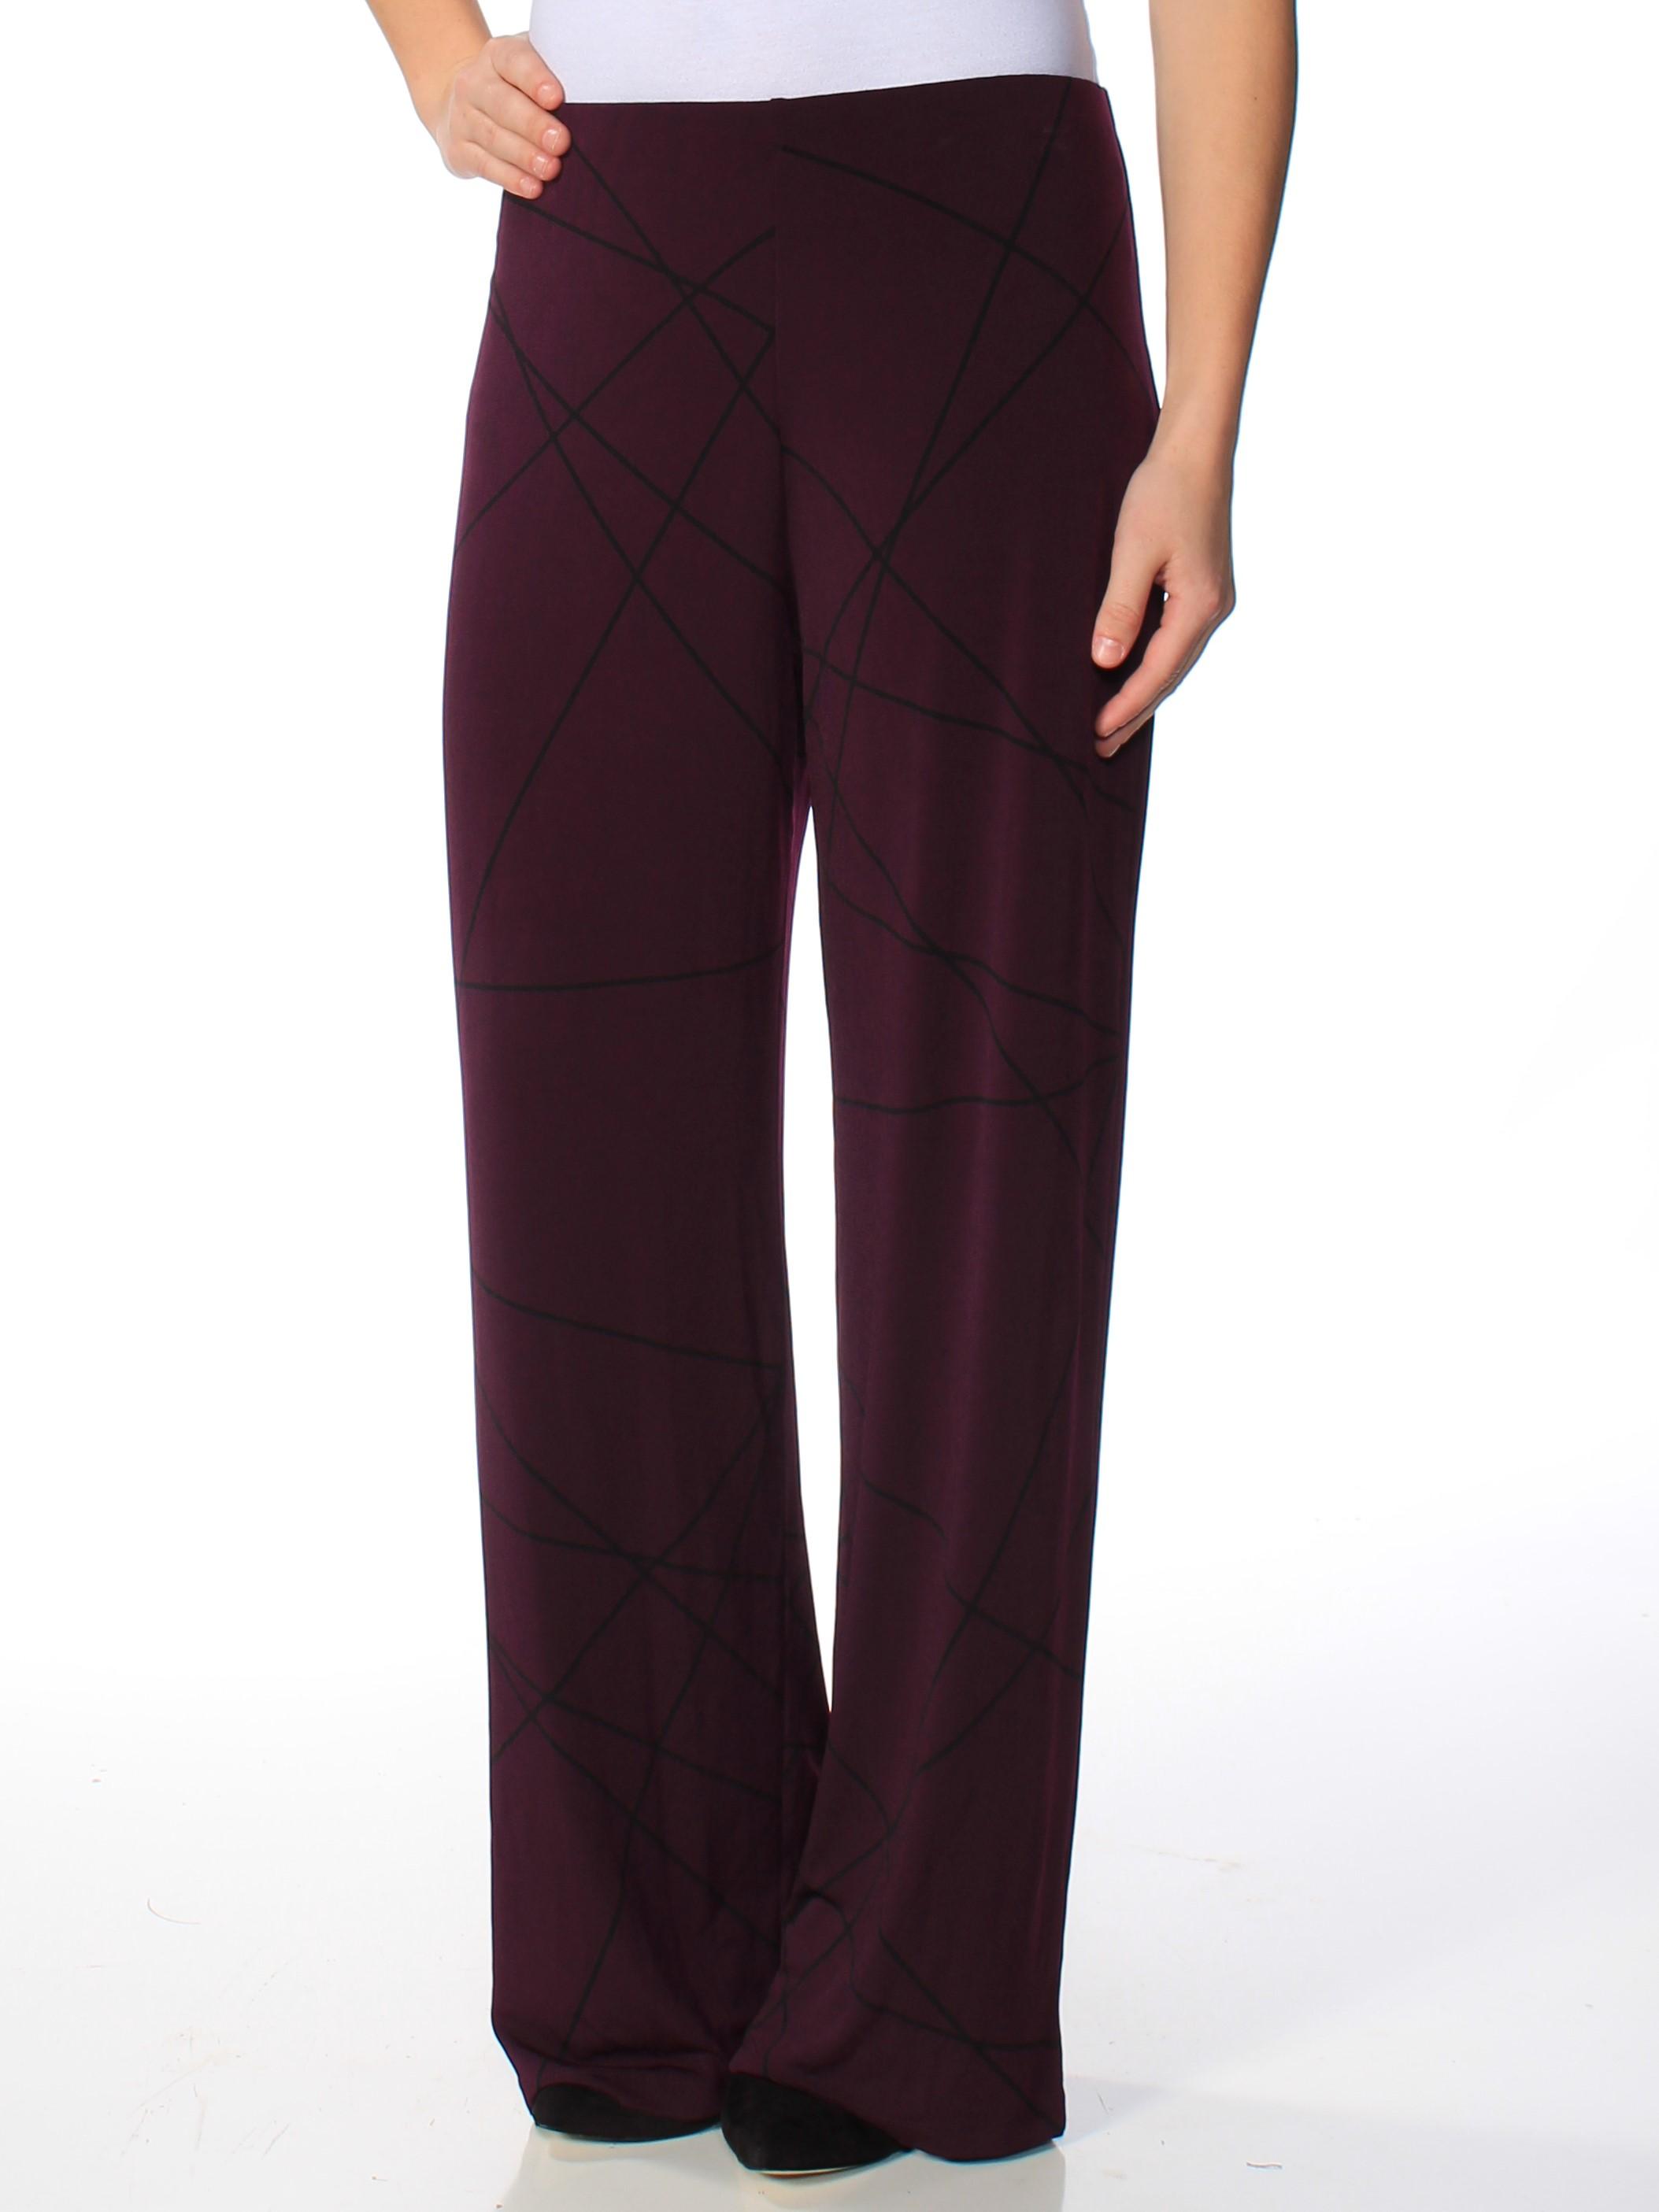 ALFANI Womens Purple Printed Pants  Size: M